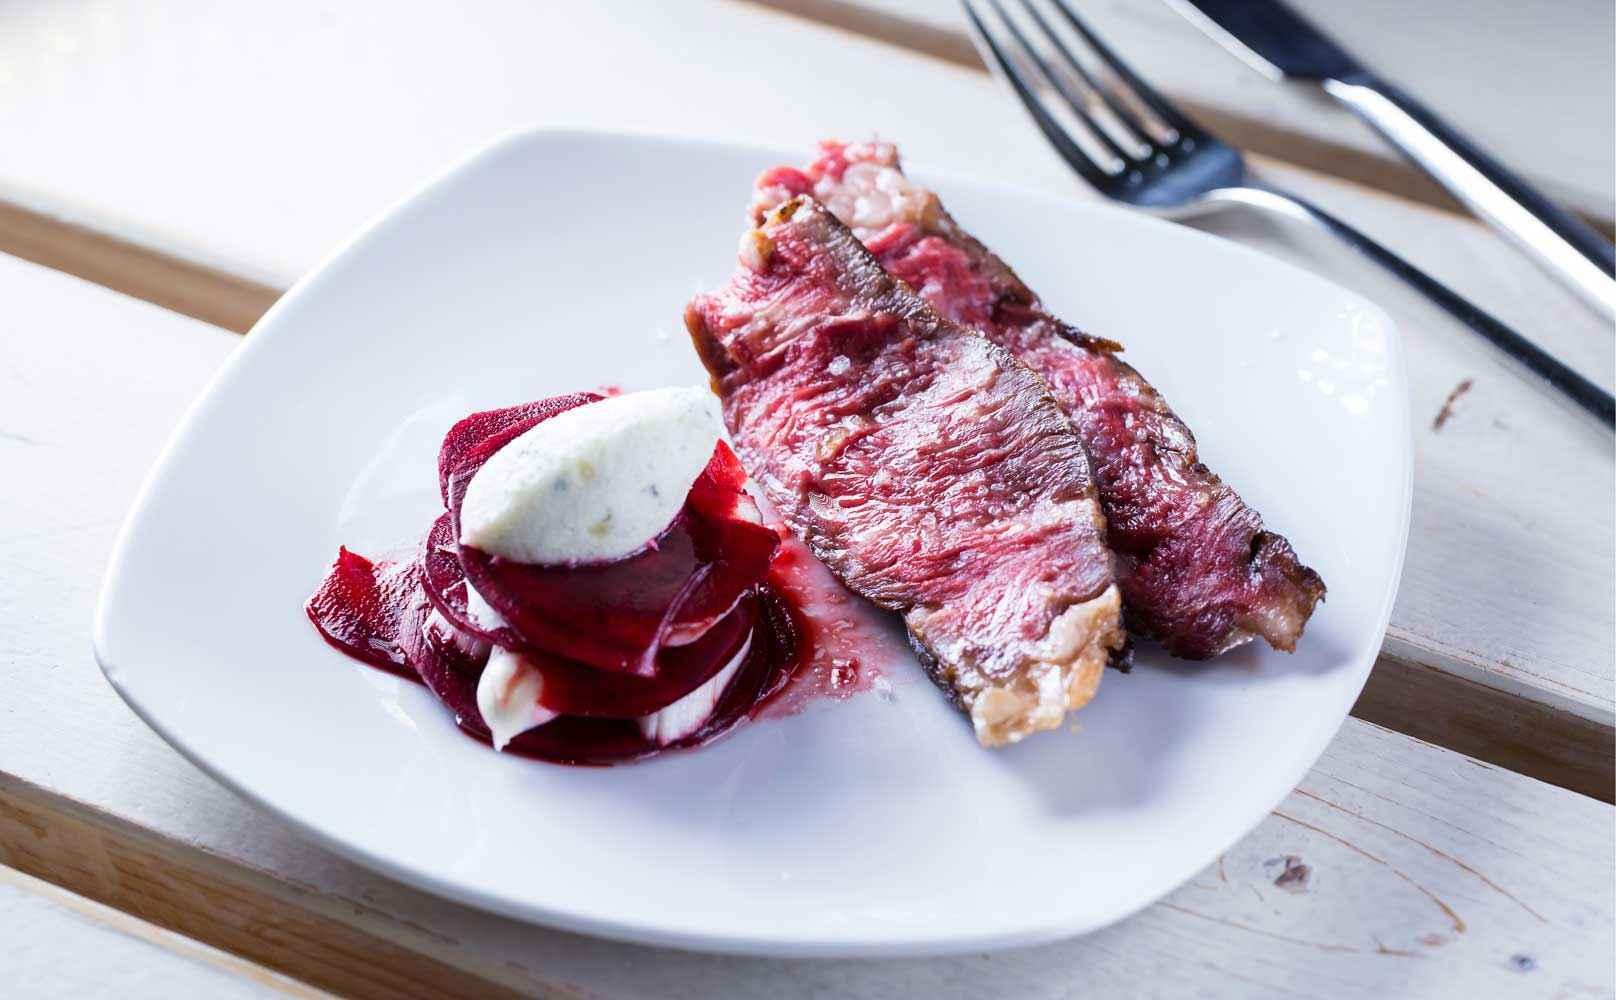 rezept f r marinierter rote bete spargel salat mit roquefort mousse effilee. Black Bedroom Furniture Sets. Home Design Ideas